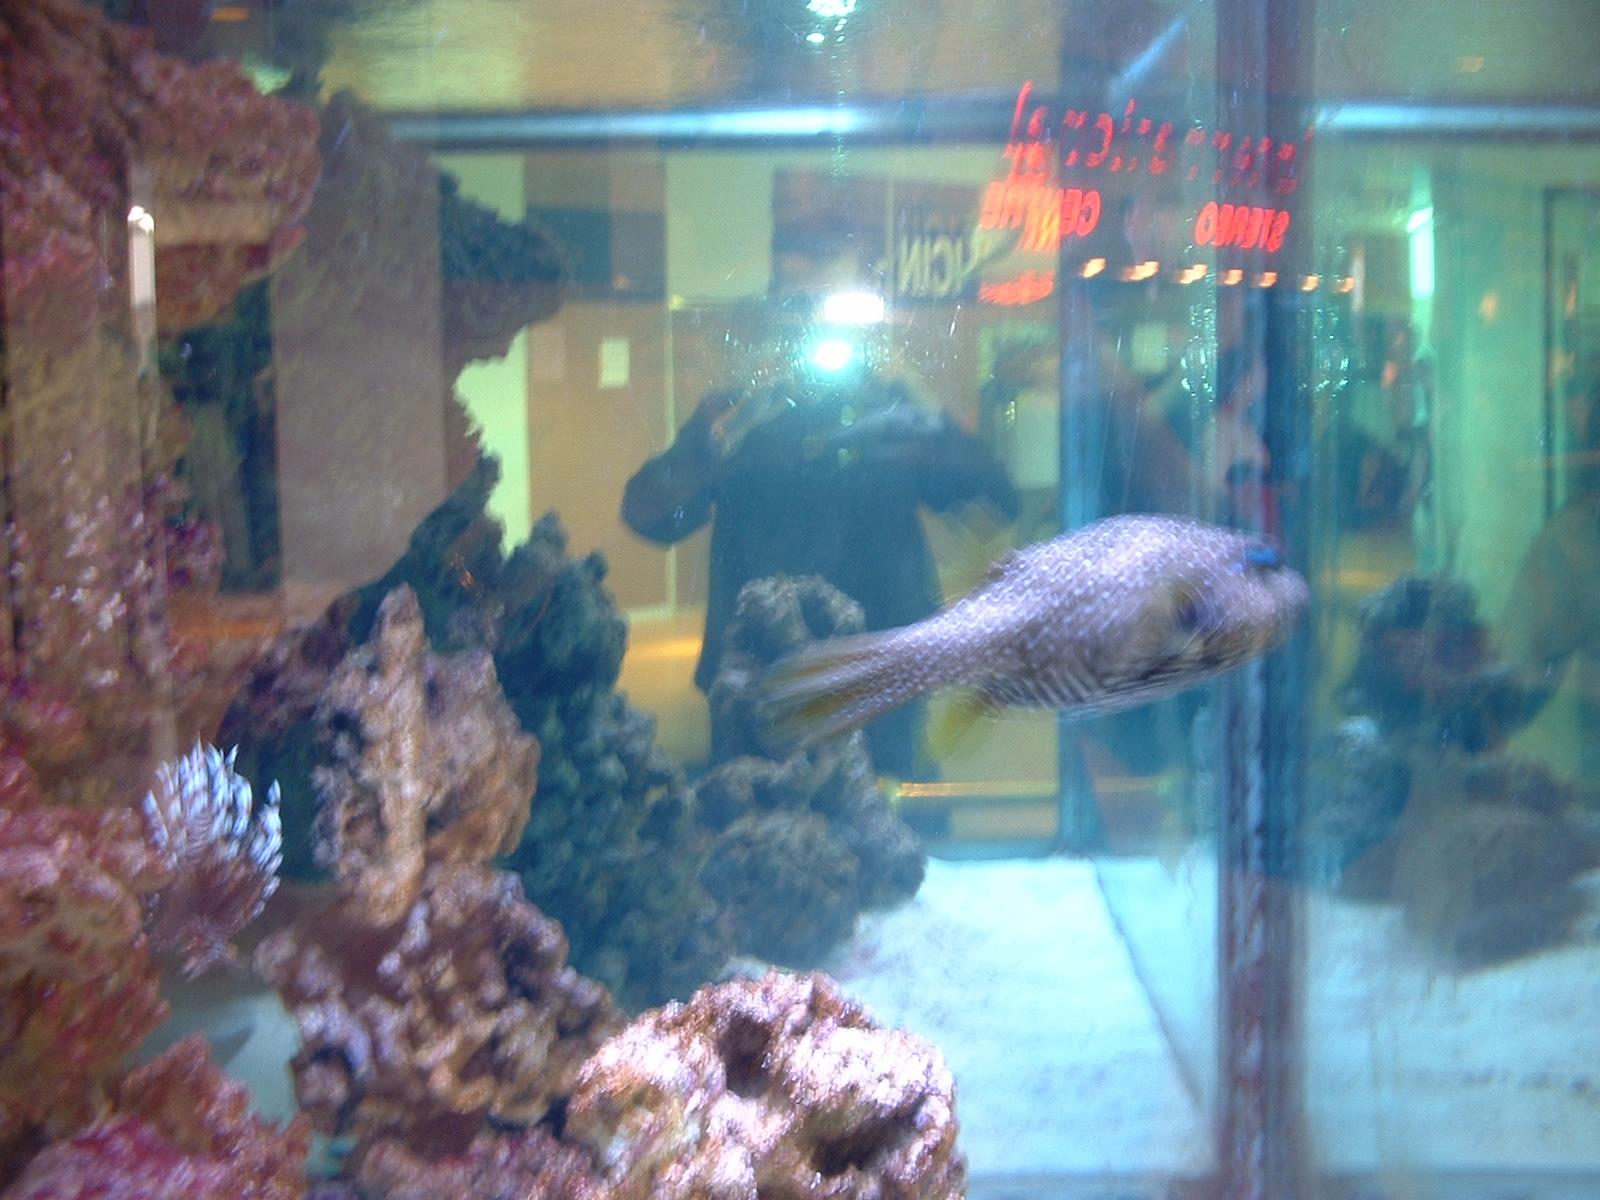 Fish aquarium edmonton - Fish Aquarium Edmonton